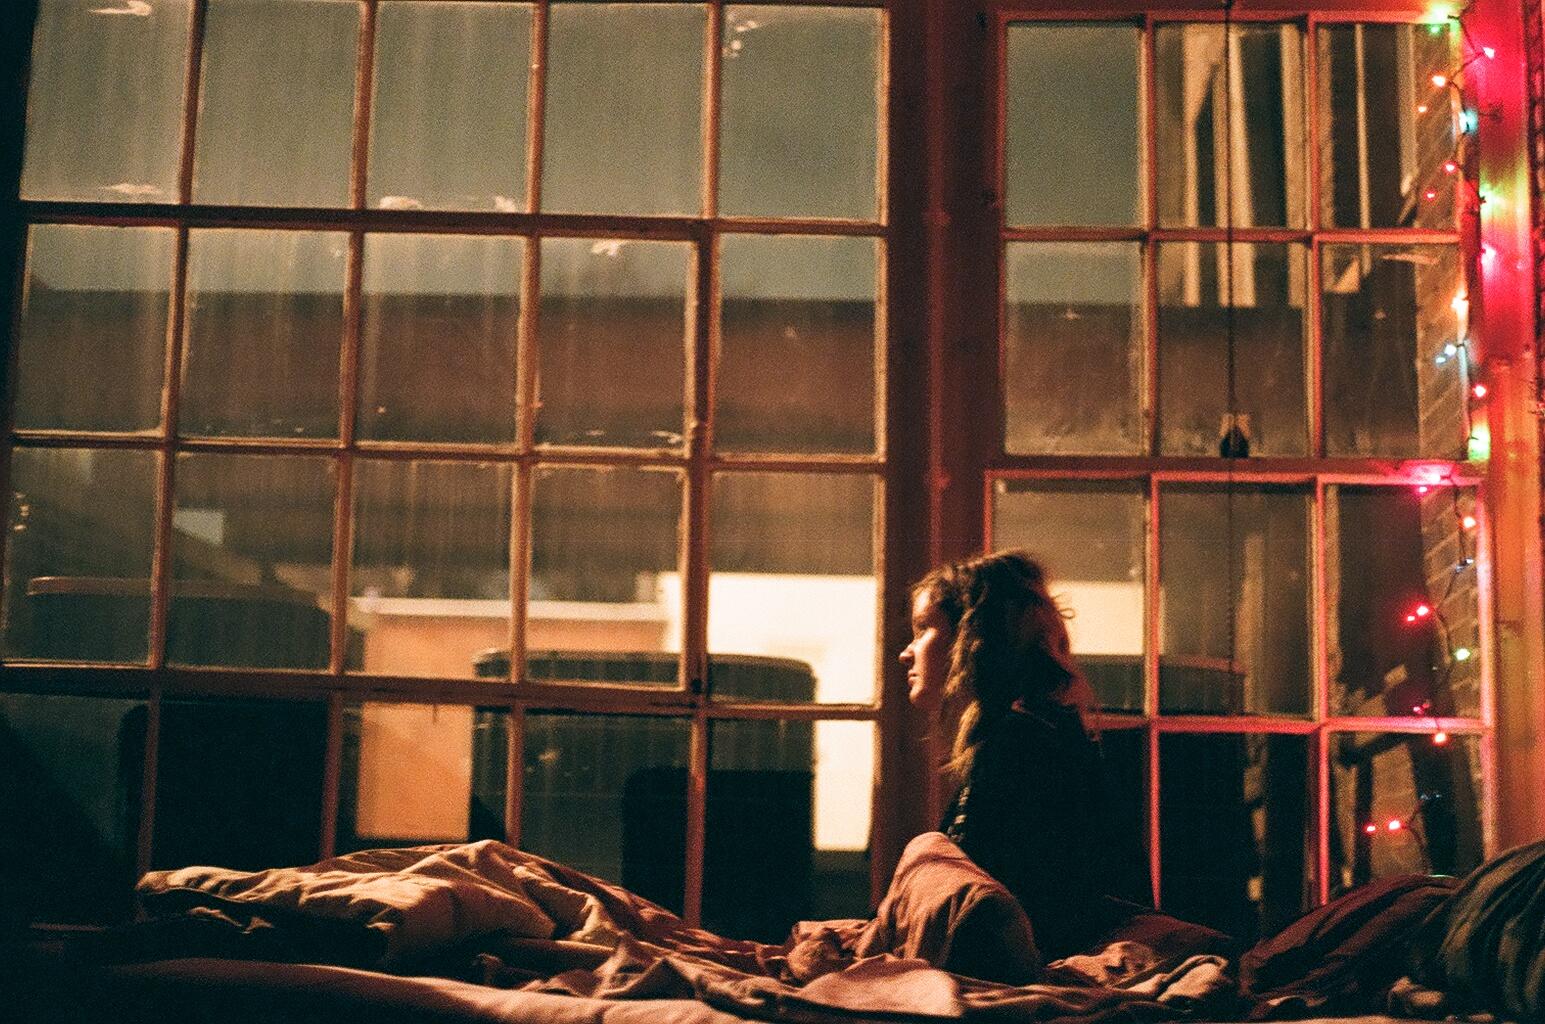 Fenster Bett Schlafzimmer 35MM Fujifilm Farbe Szene Mädchen Beleuchtung  Farbe Mich Film Dunkelheit Weihnachtsbeleuchtung Lichterketten